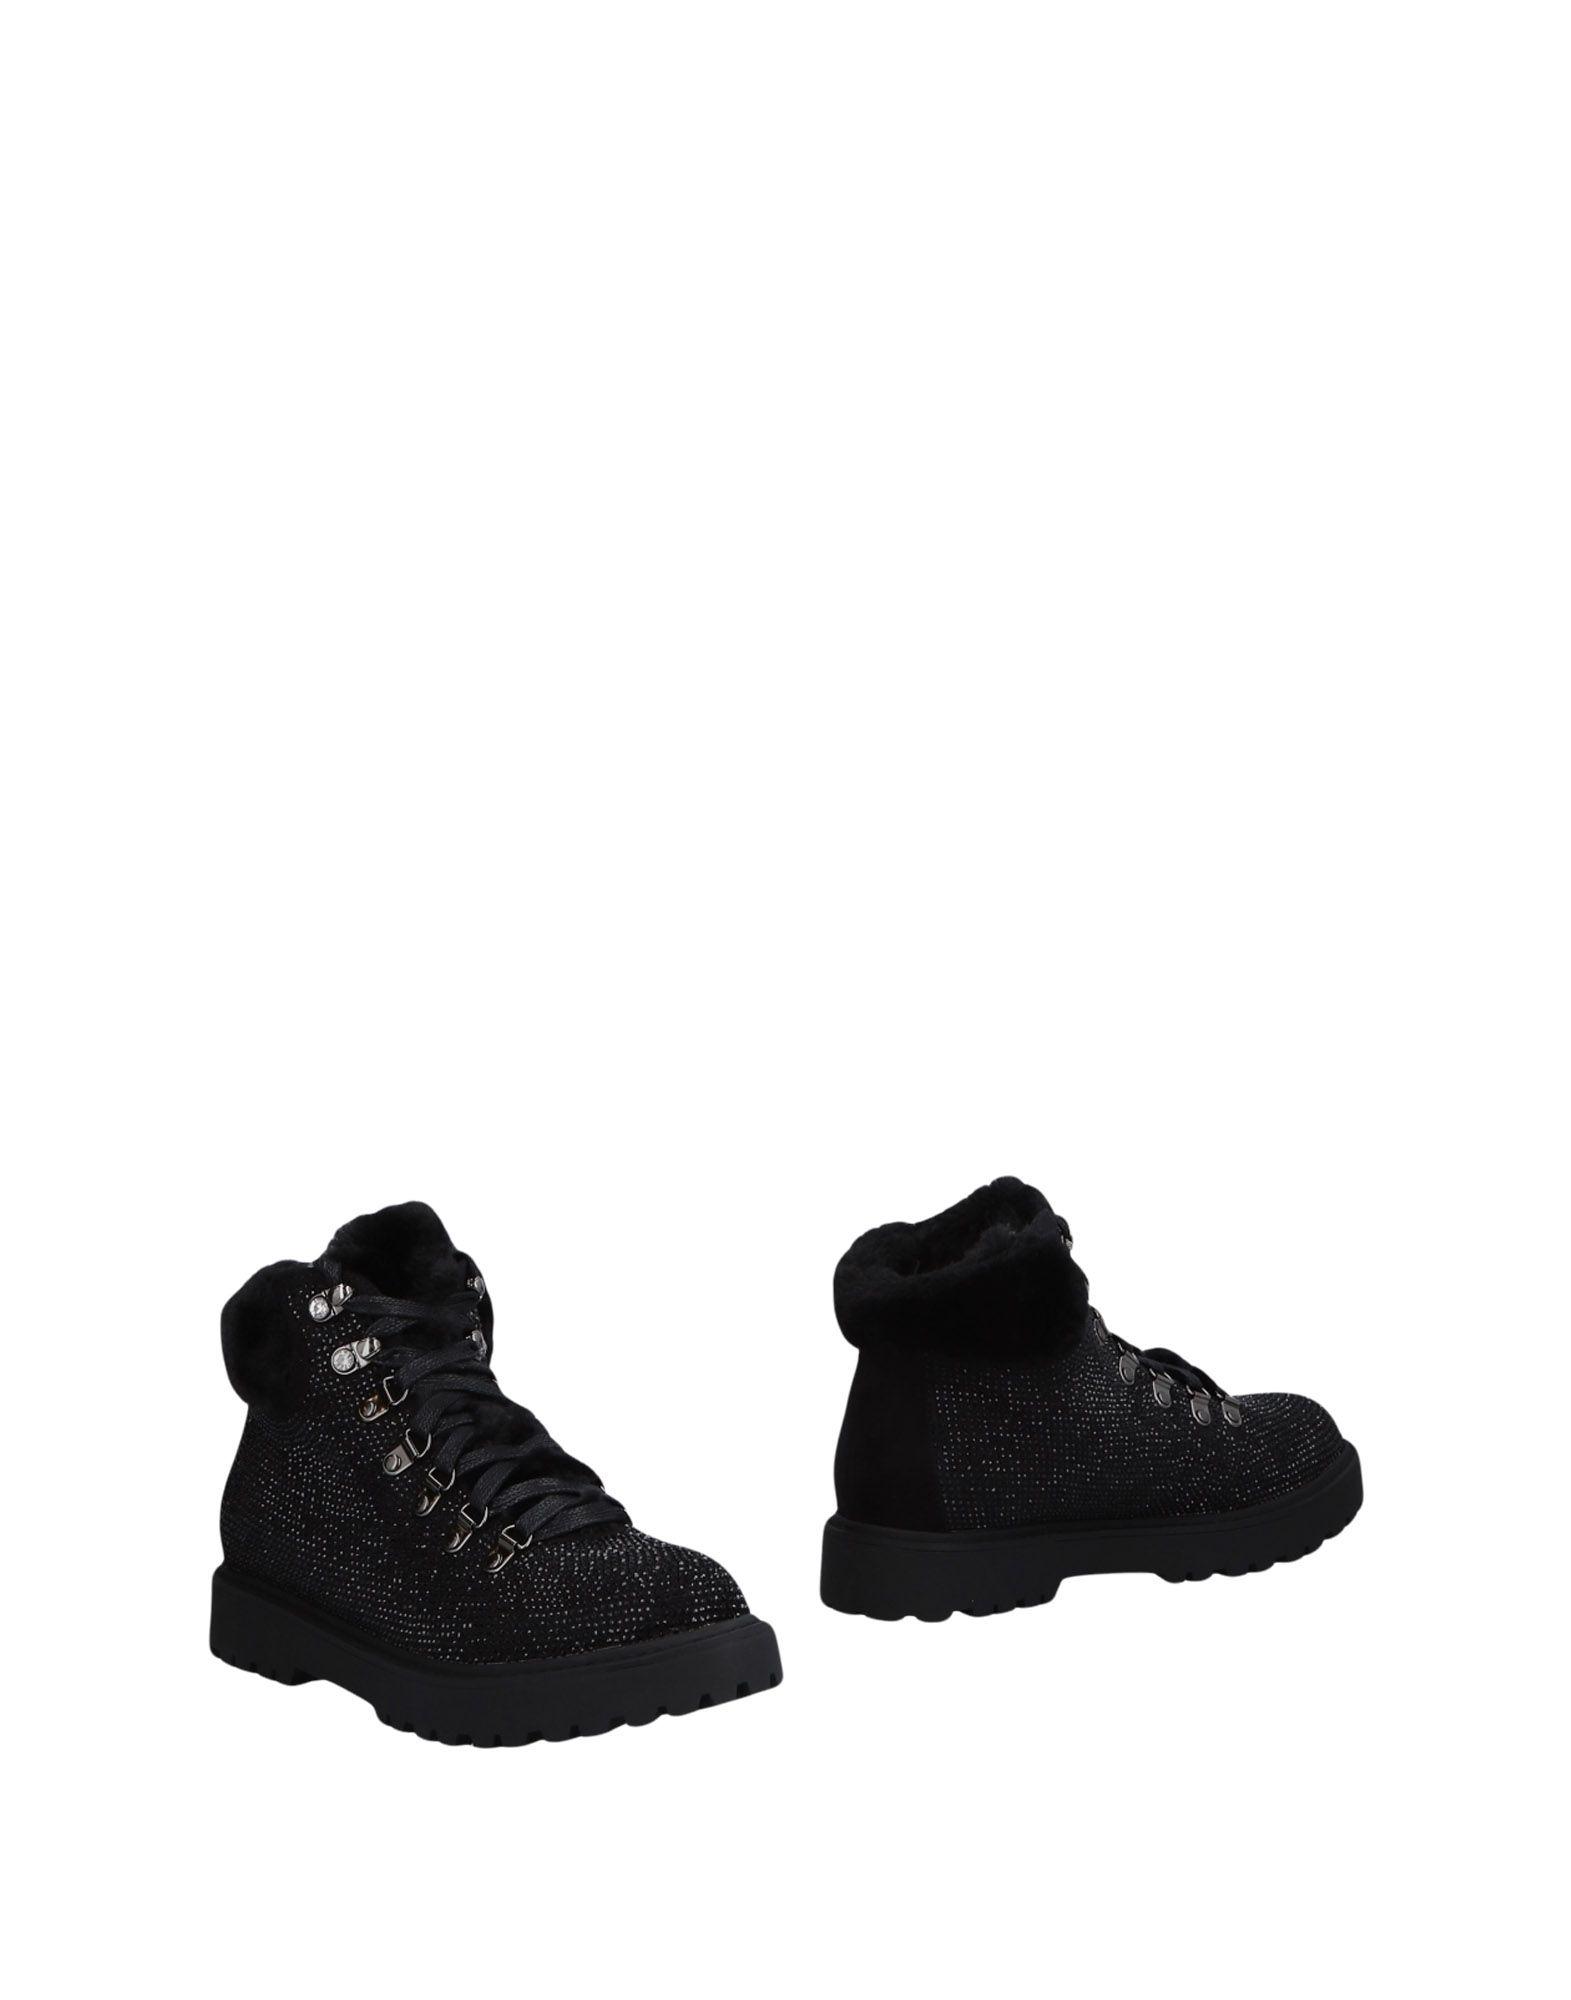 Tosca 11475764GA Blu Shoes Stiefelette Damen  11475764GA Tosca Gute Qualität beliebte Schuhe 8c242d